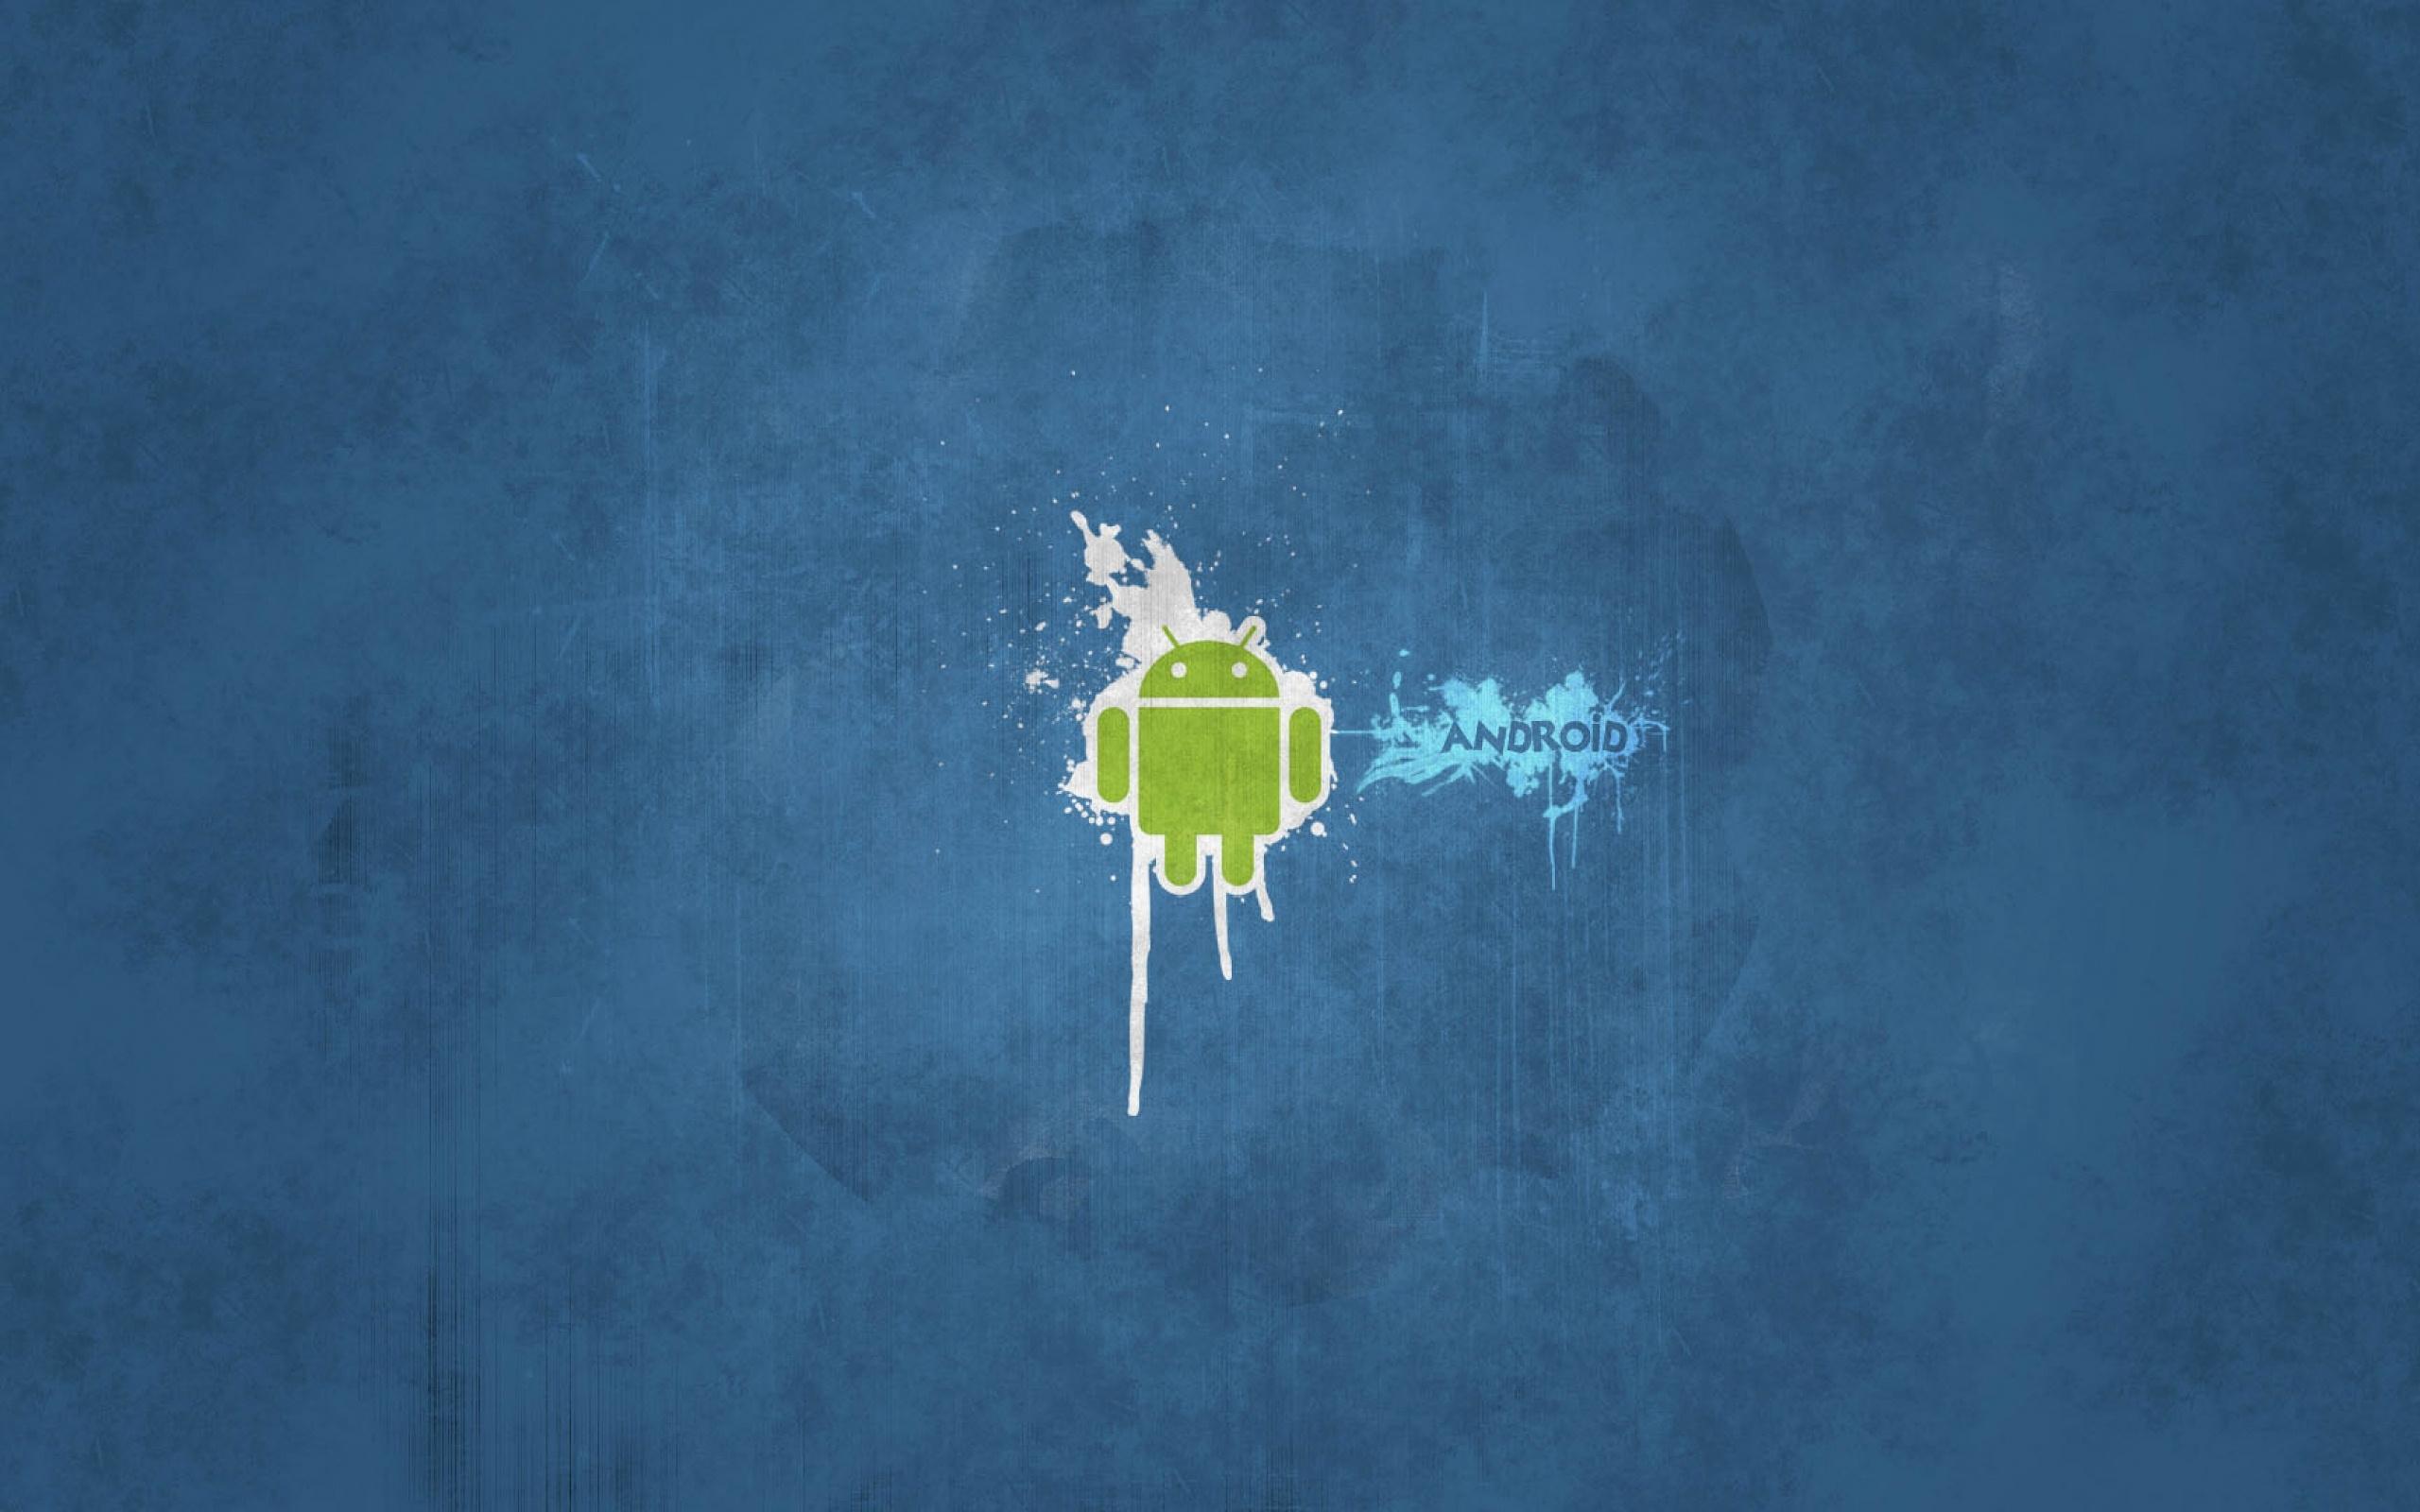 75 Android Blue Wallpaper On Wallpapersafari